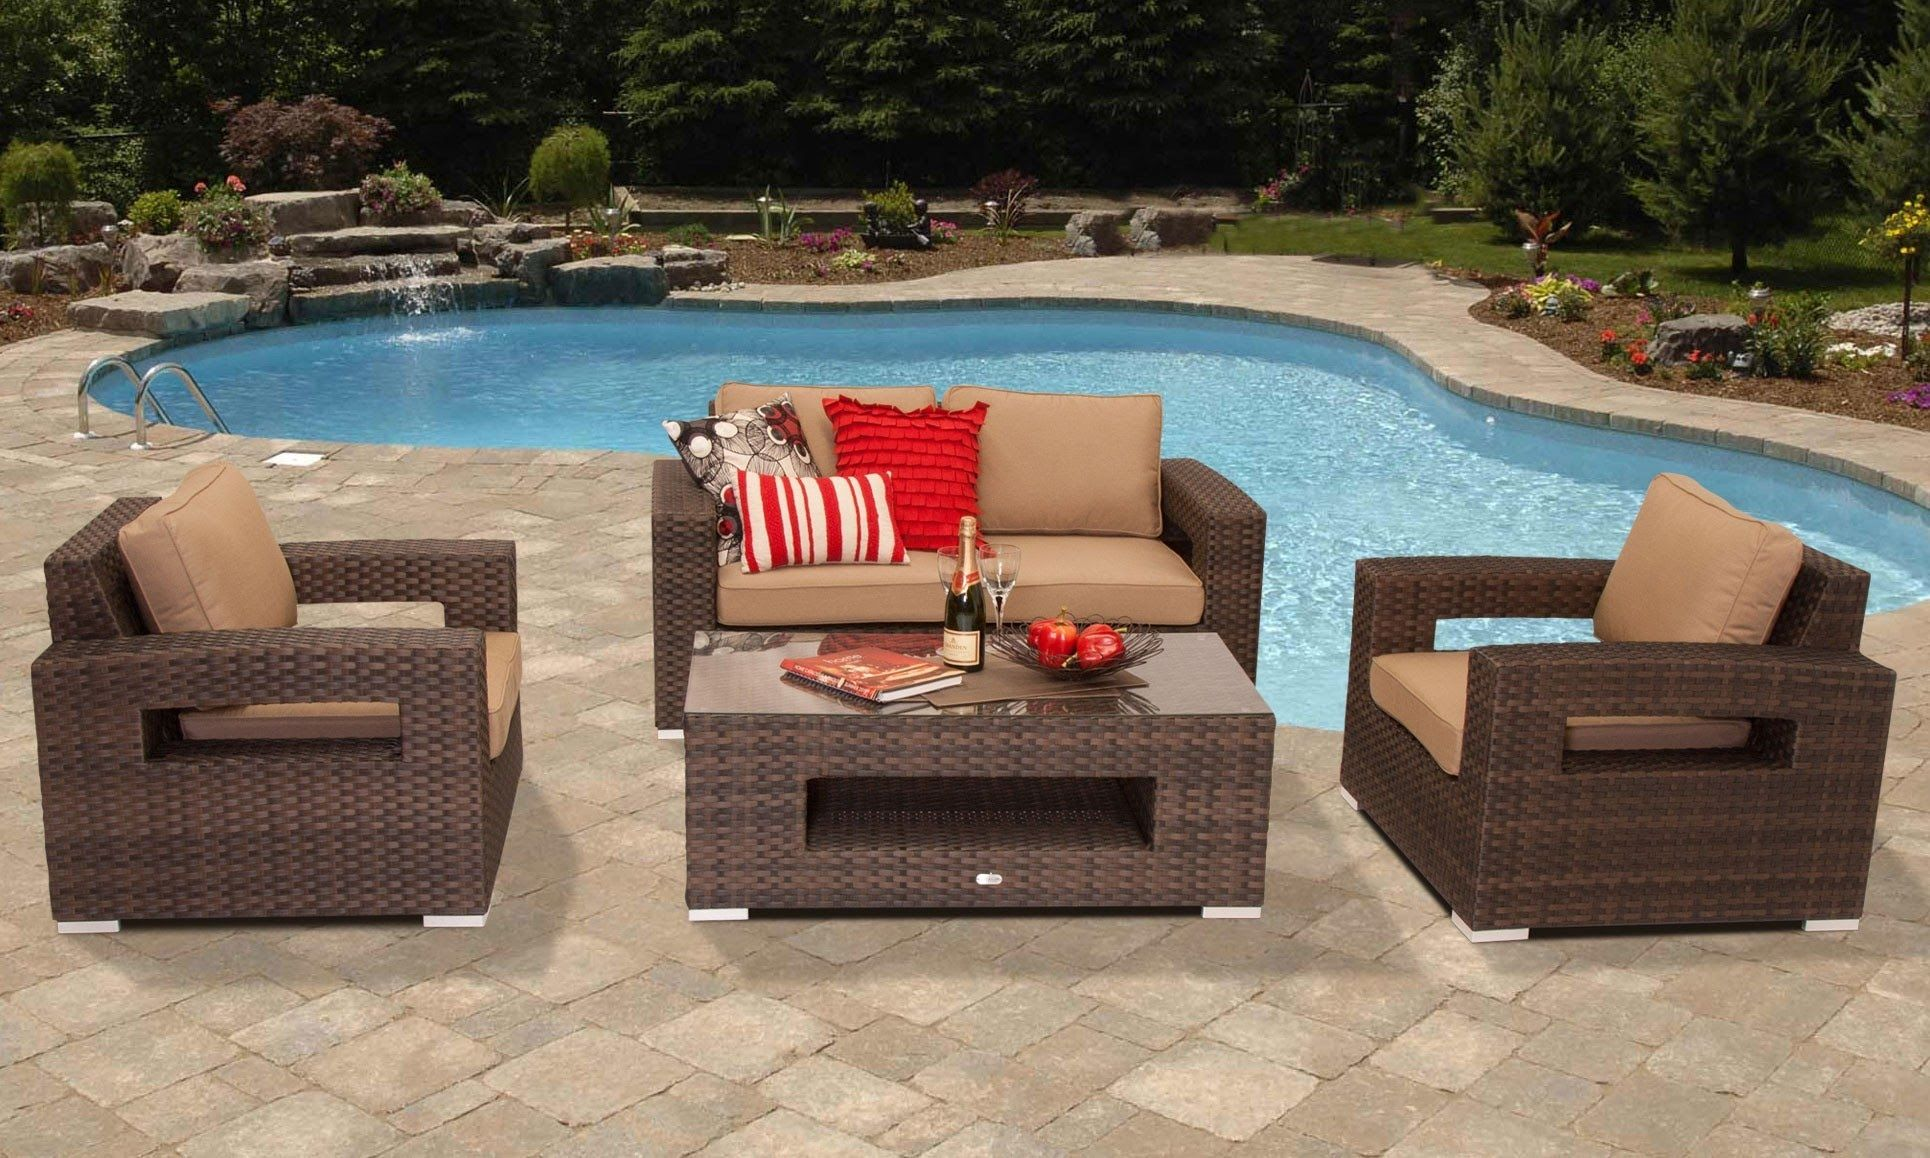 patio chair covers australia leather wing chairs uk sunbrella furnituresunbrella outdoor furniture dining room